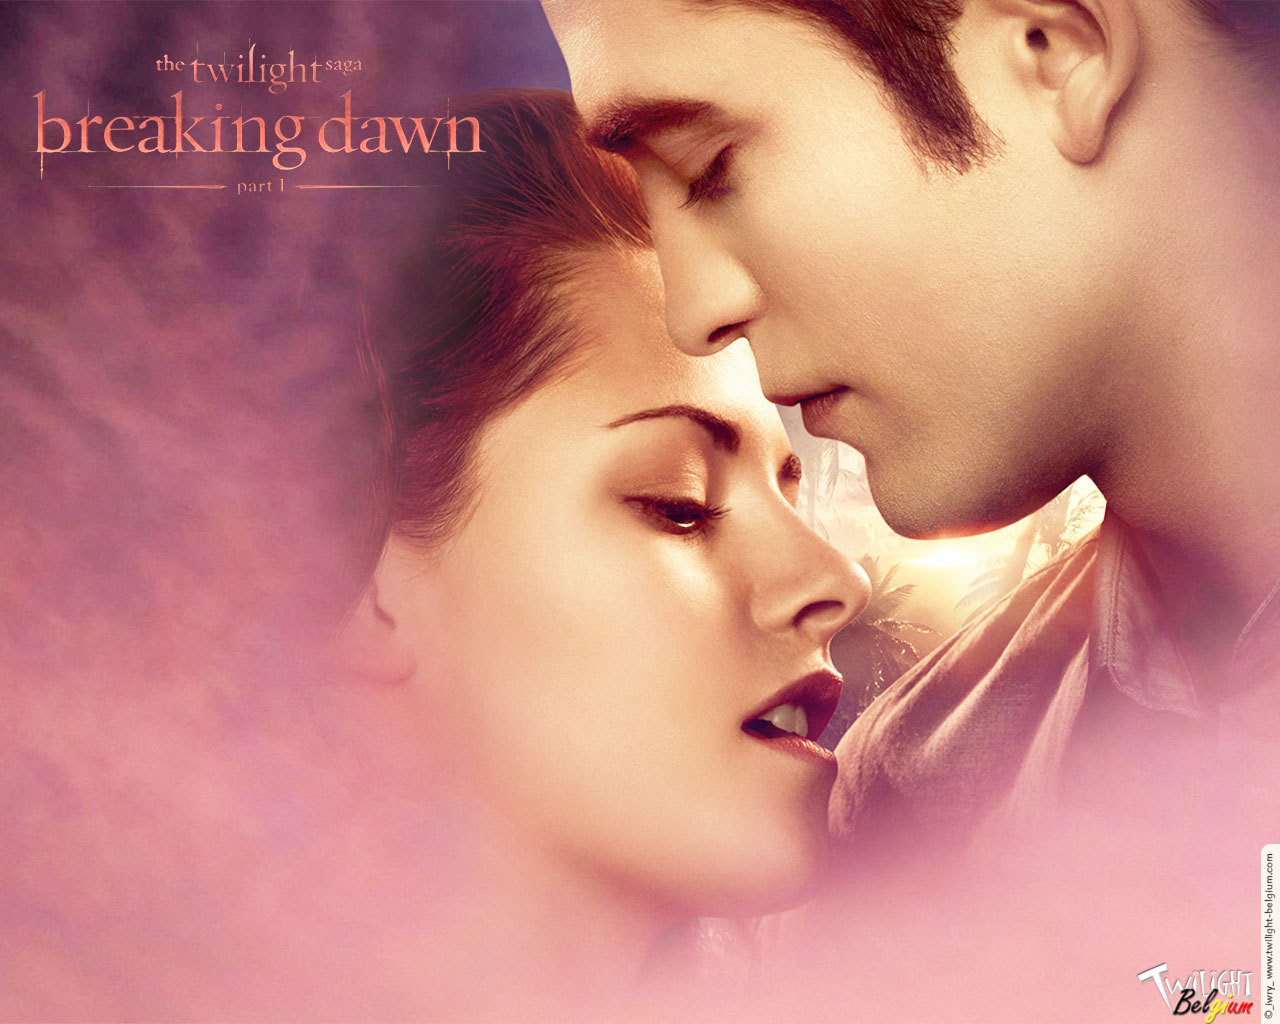 Edward Bella The Twilight Saga Breaking Dawn Part 1 Wallpaper